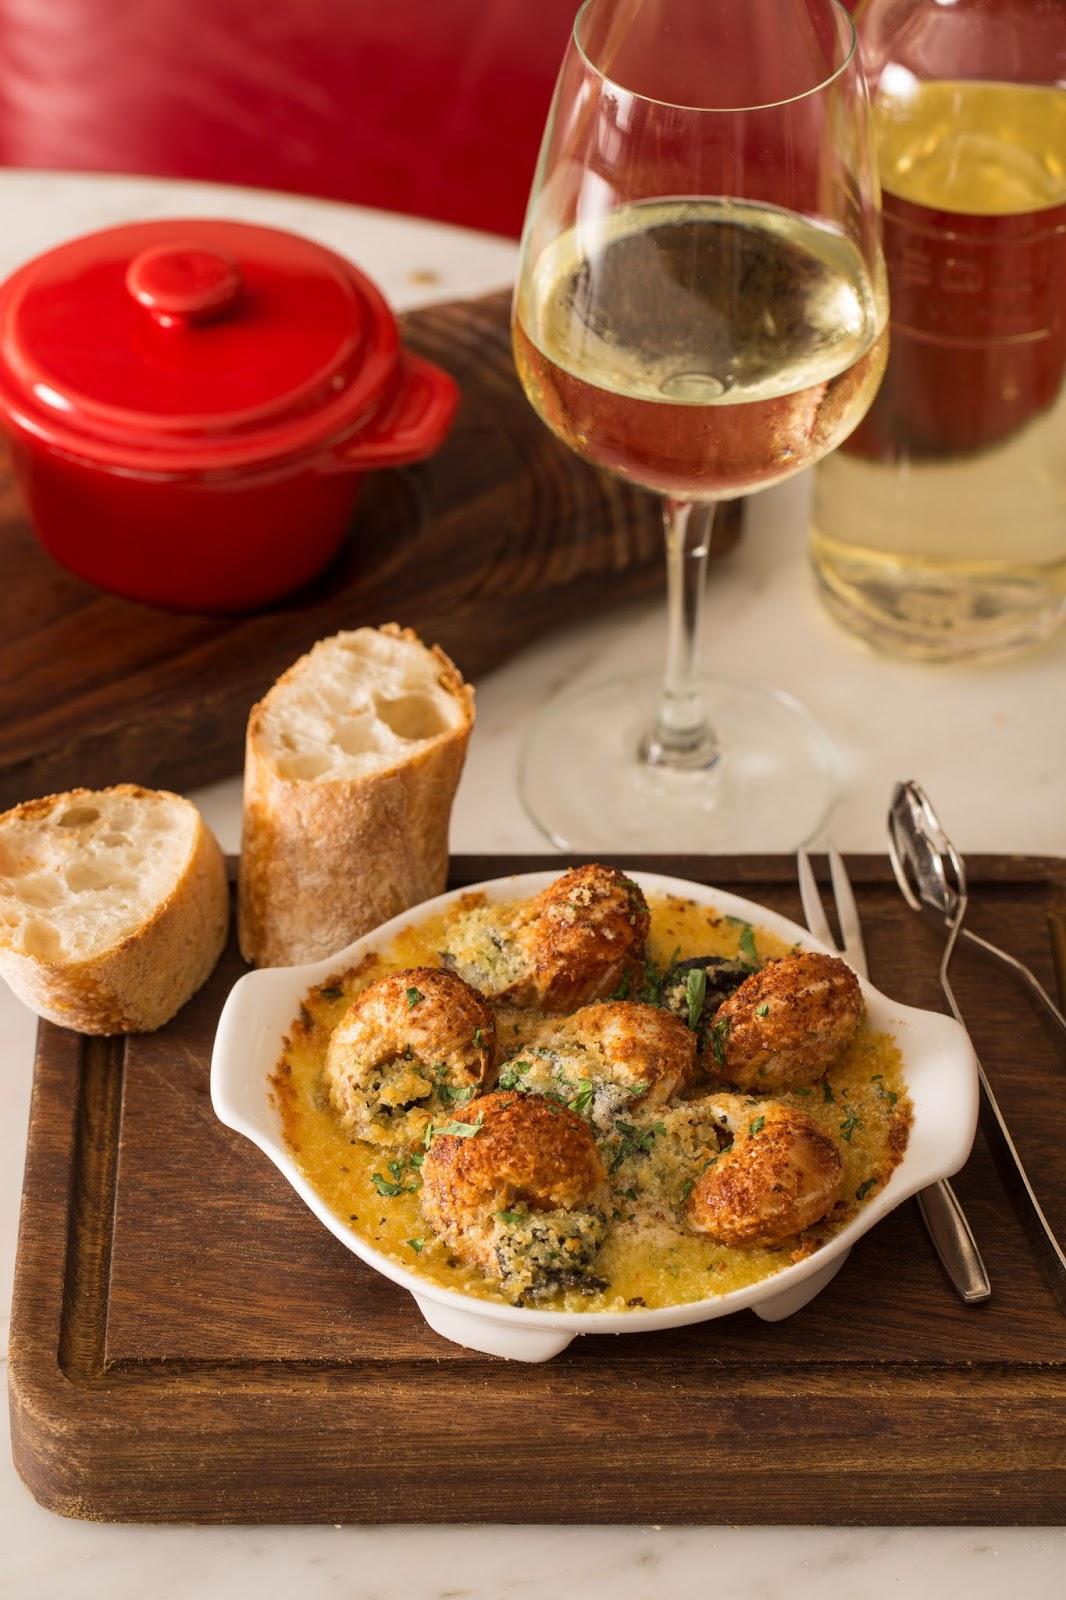 Plat du Jour, Escargot, Friday seafood feast, seafood, mashed potato, garlic